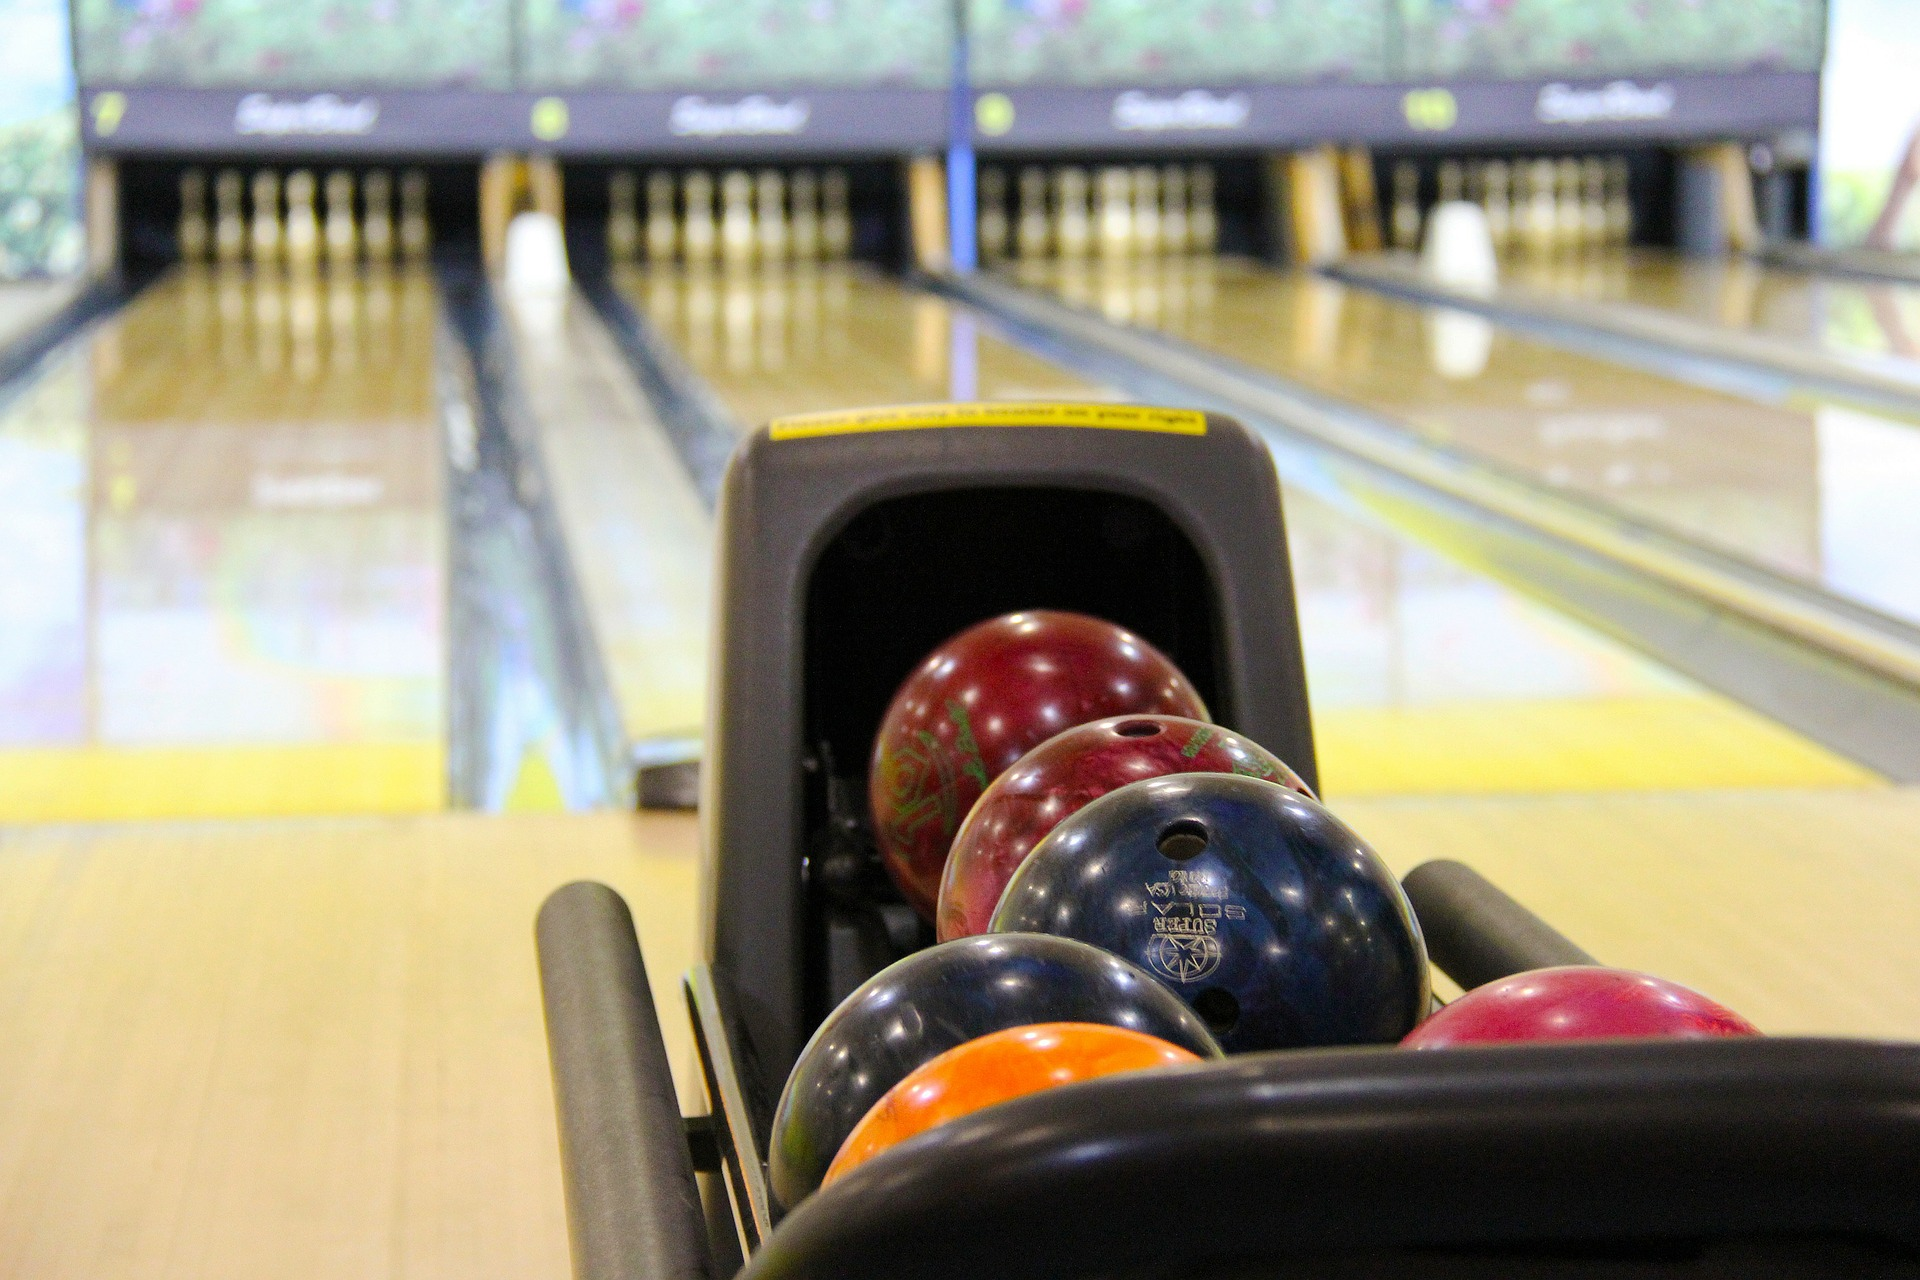 Jullovs bowling